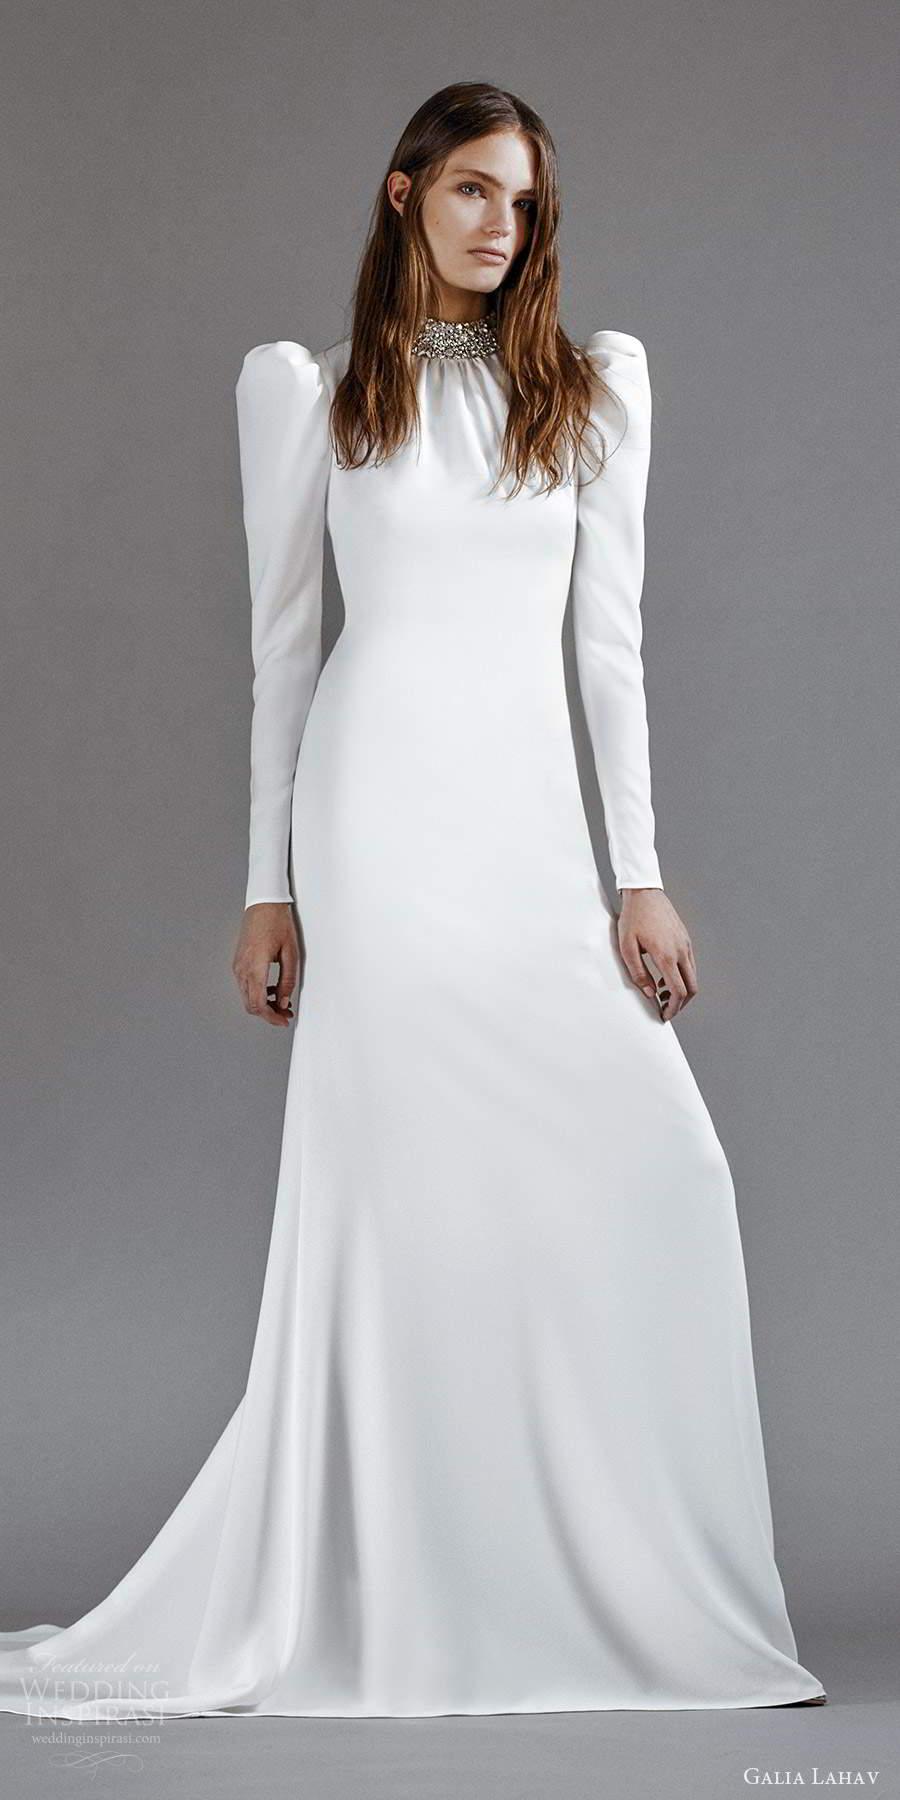 galia lahav 2021 rtw bridal long puff sleeves embellished high neckline clean minimalist sheath column a line wedding dress chapel train (6) mv